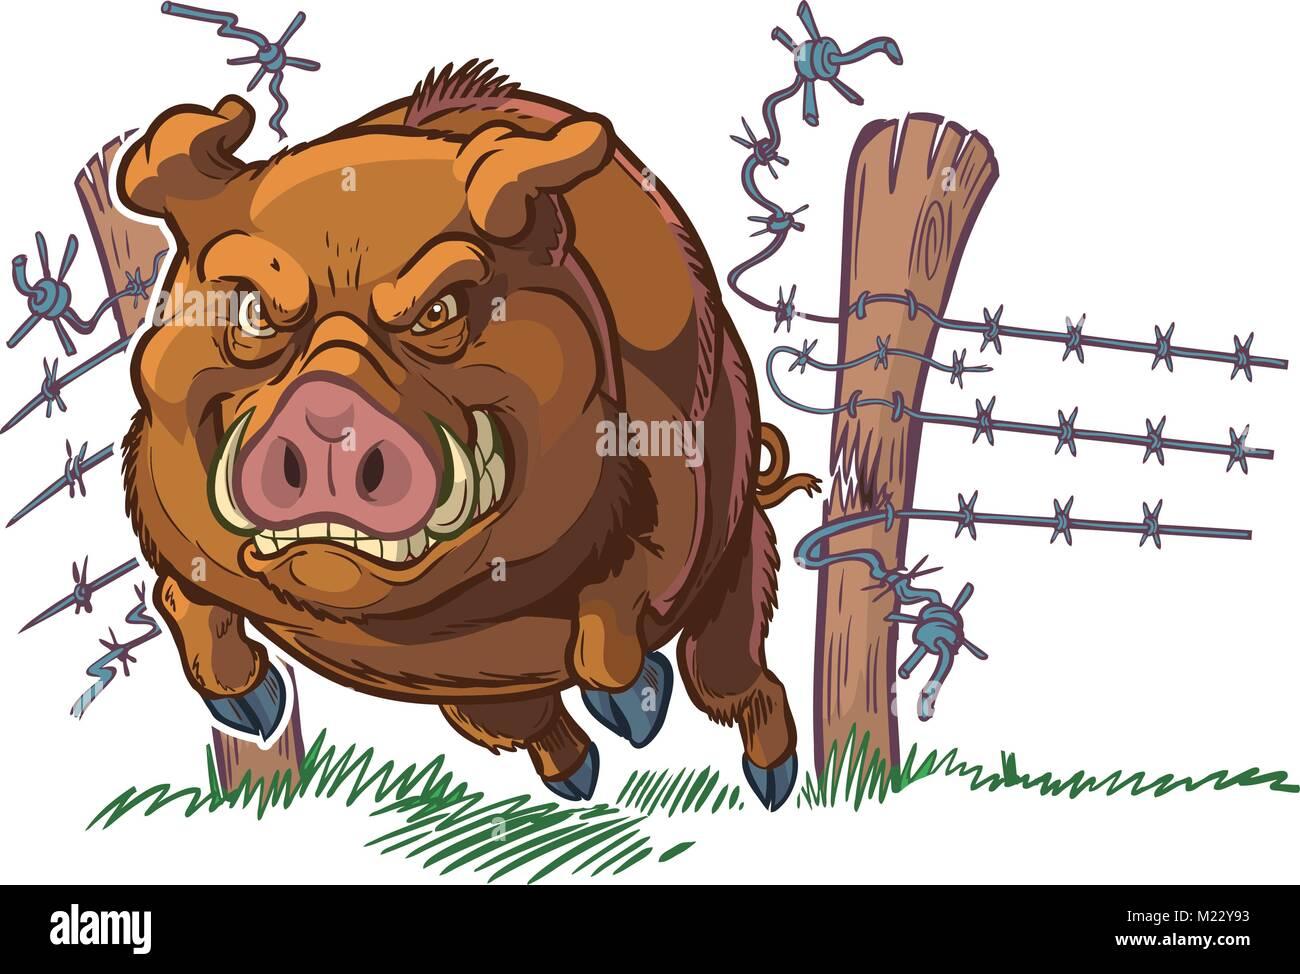 Vector Cartoon Clip Art Illustration Of A Tough And Mean Pig Or Hog